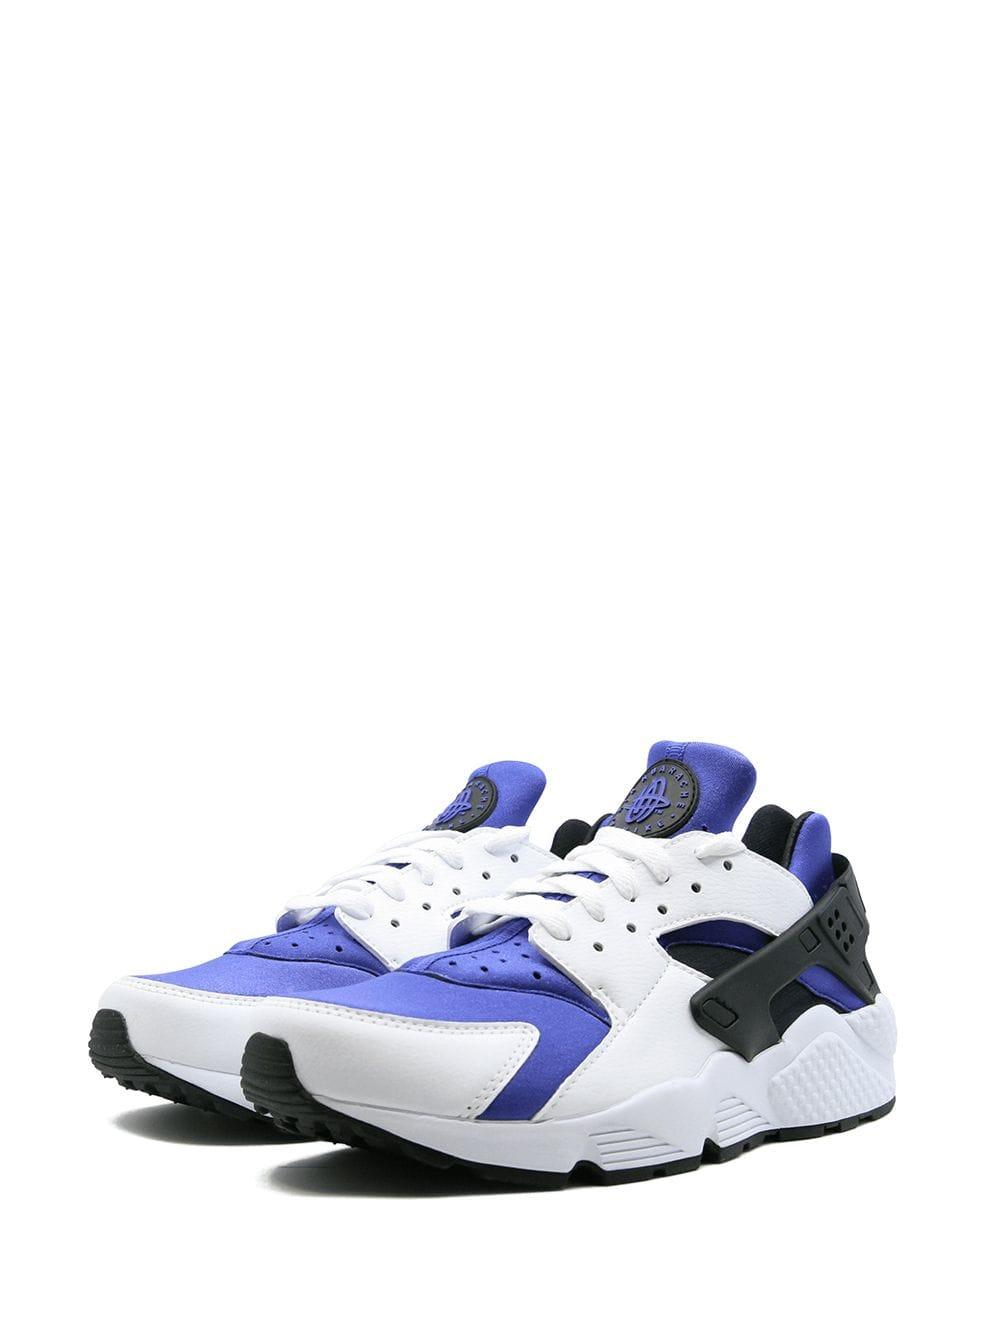 2ec604c41011 Nike Air Huarache Run Se Sneakers in White for Men - Lyst